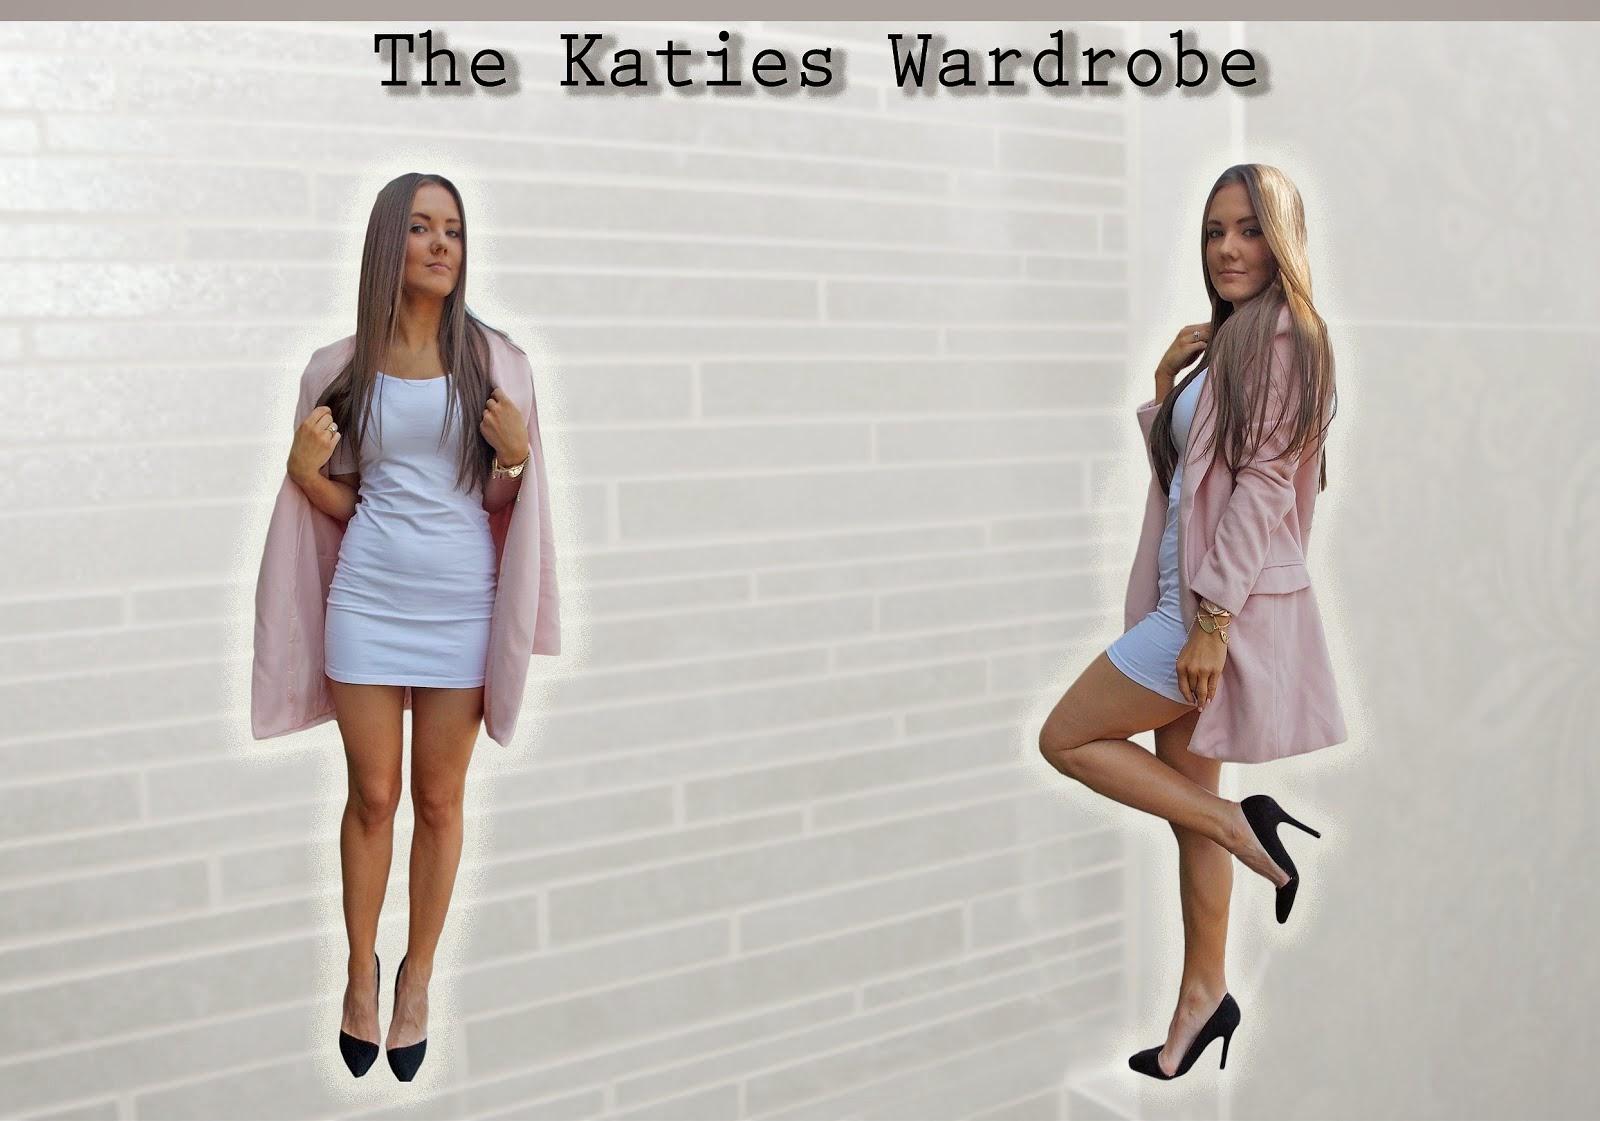 The Katies Wardrobe